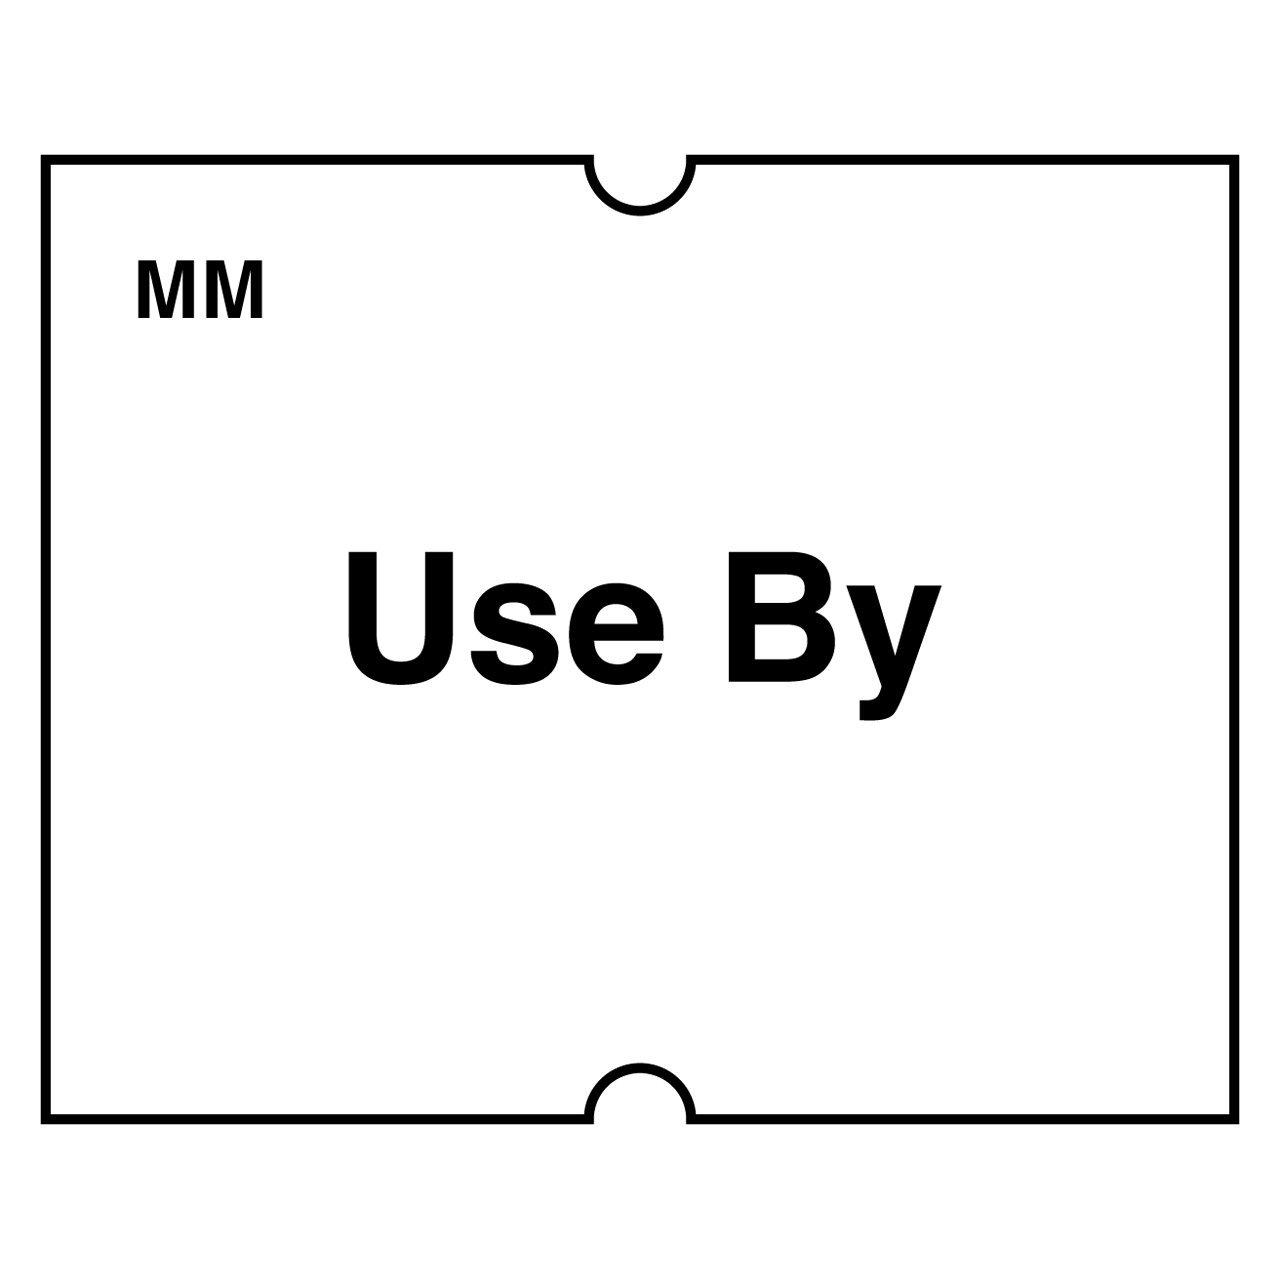 DayMark Date Coder''USE BY'' Removable Label, For DM4 SpeedyMark Express 20 2-Line Marking Gun, White (6,000 labels)